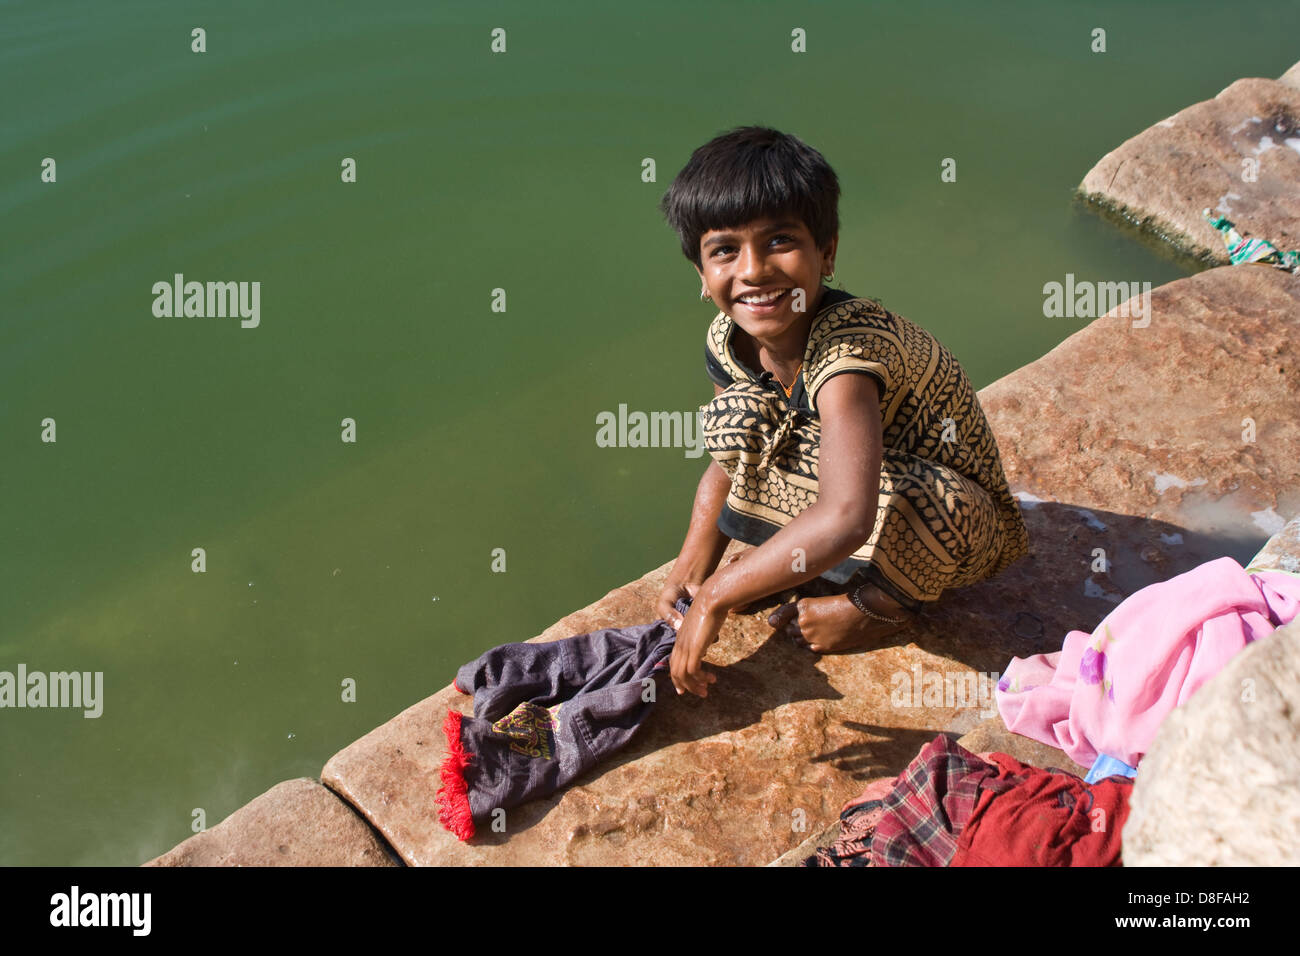 Asien, Indien, Karnataka, Banashankari, näher Waescht Kinderkleidung Stockbild